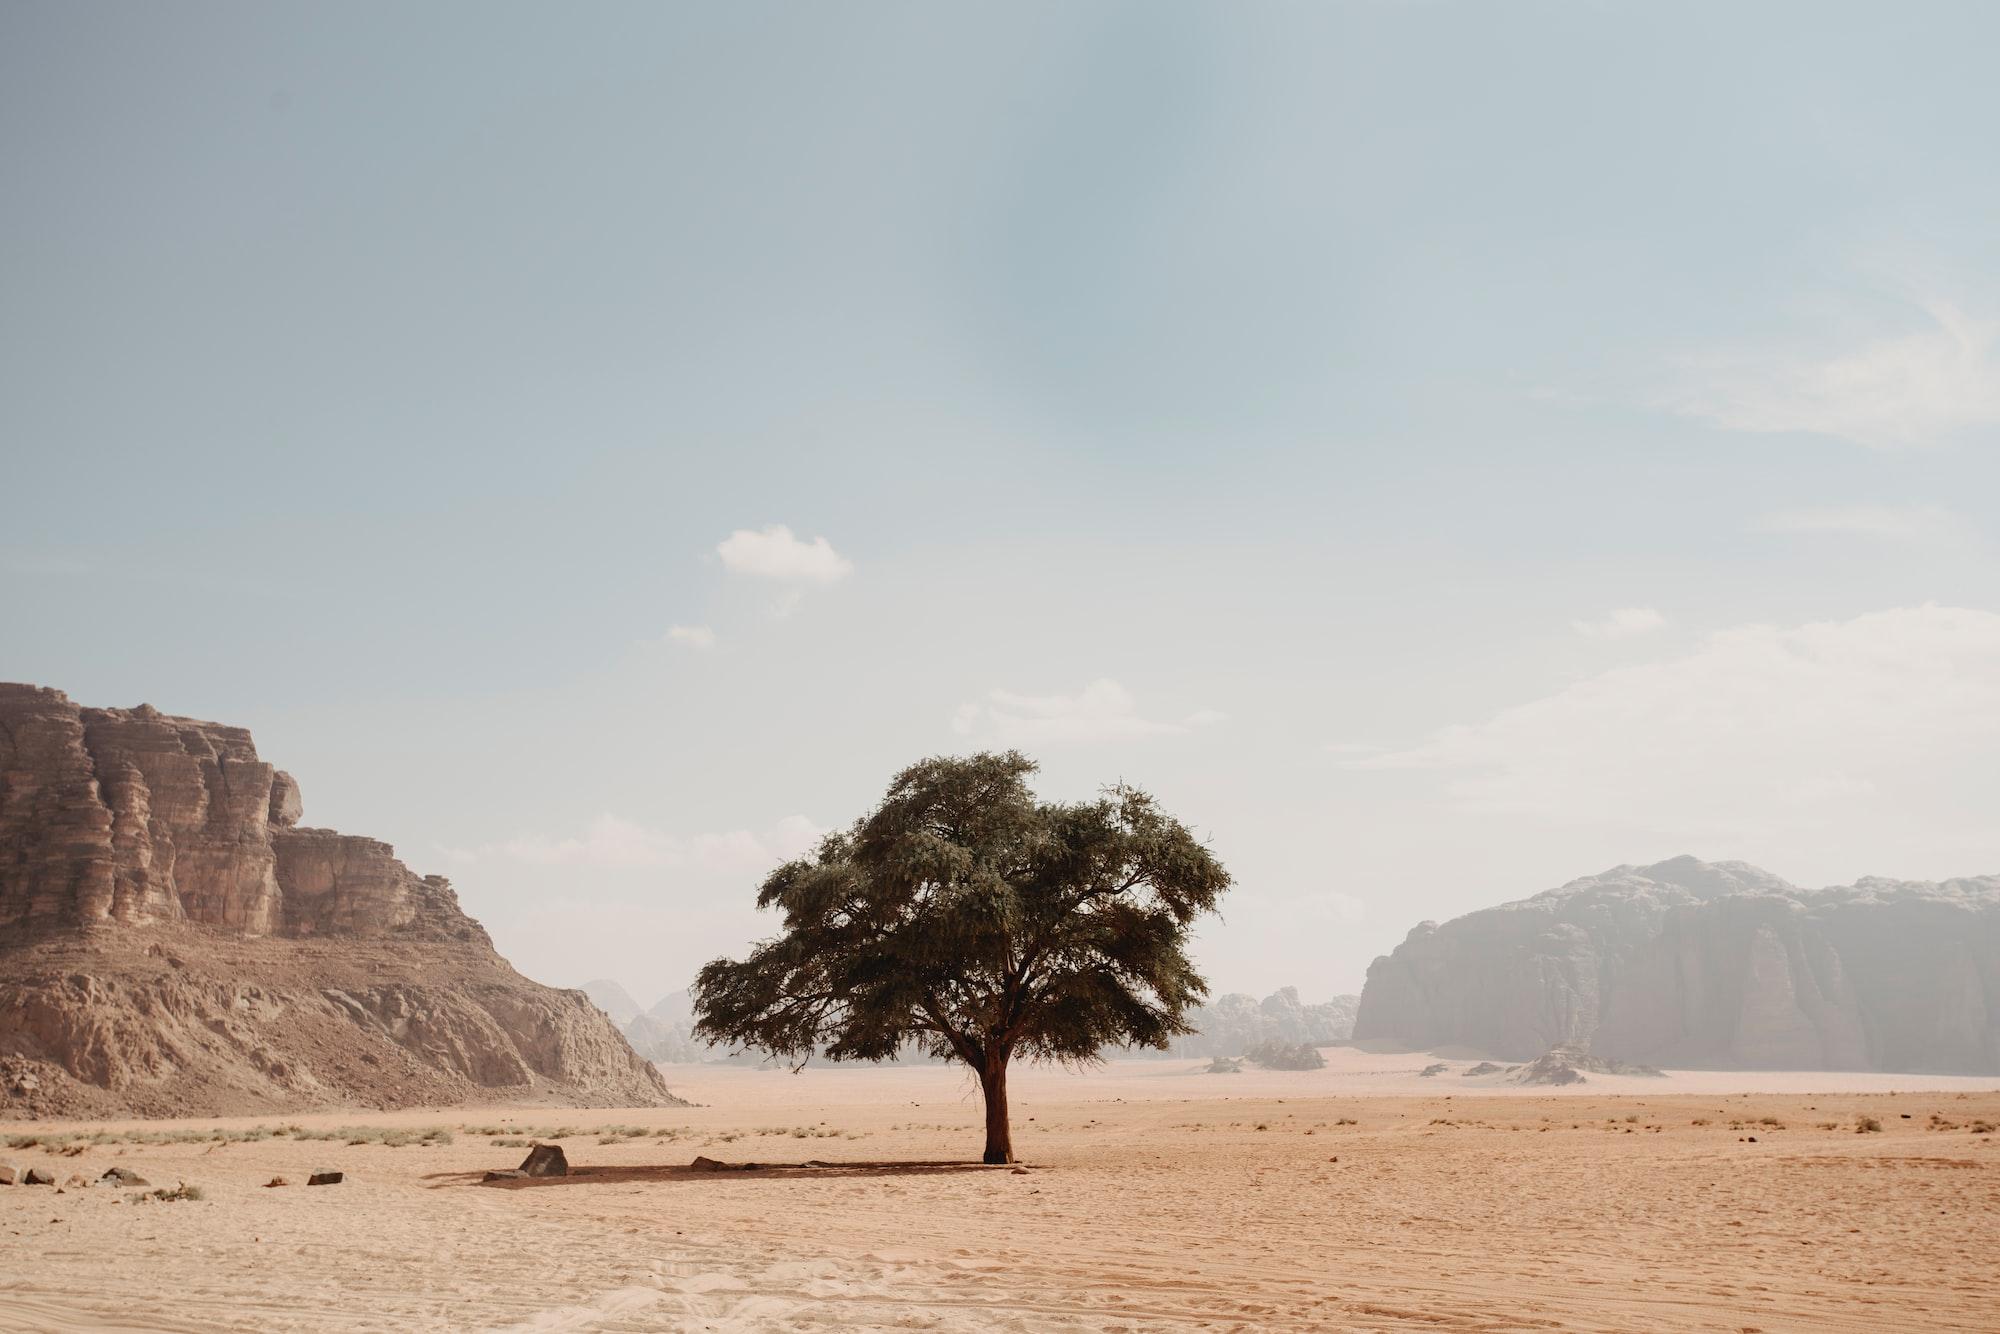 Alone tree has grown in the middle of Jordan desert.